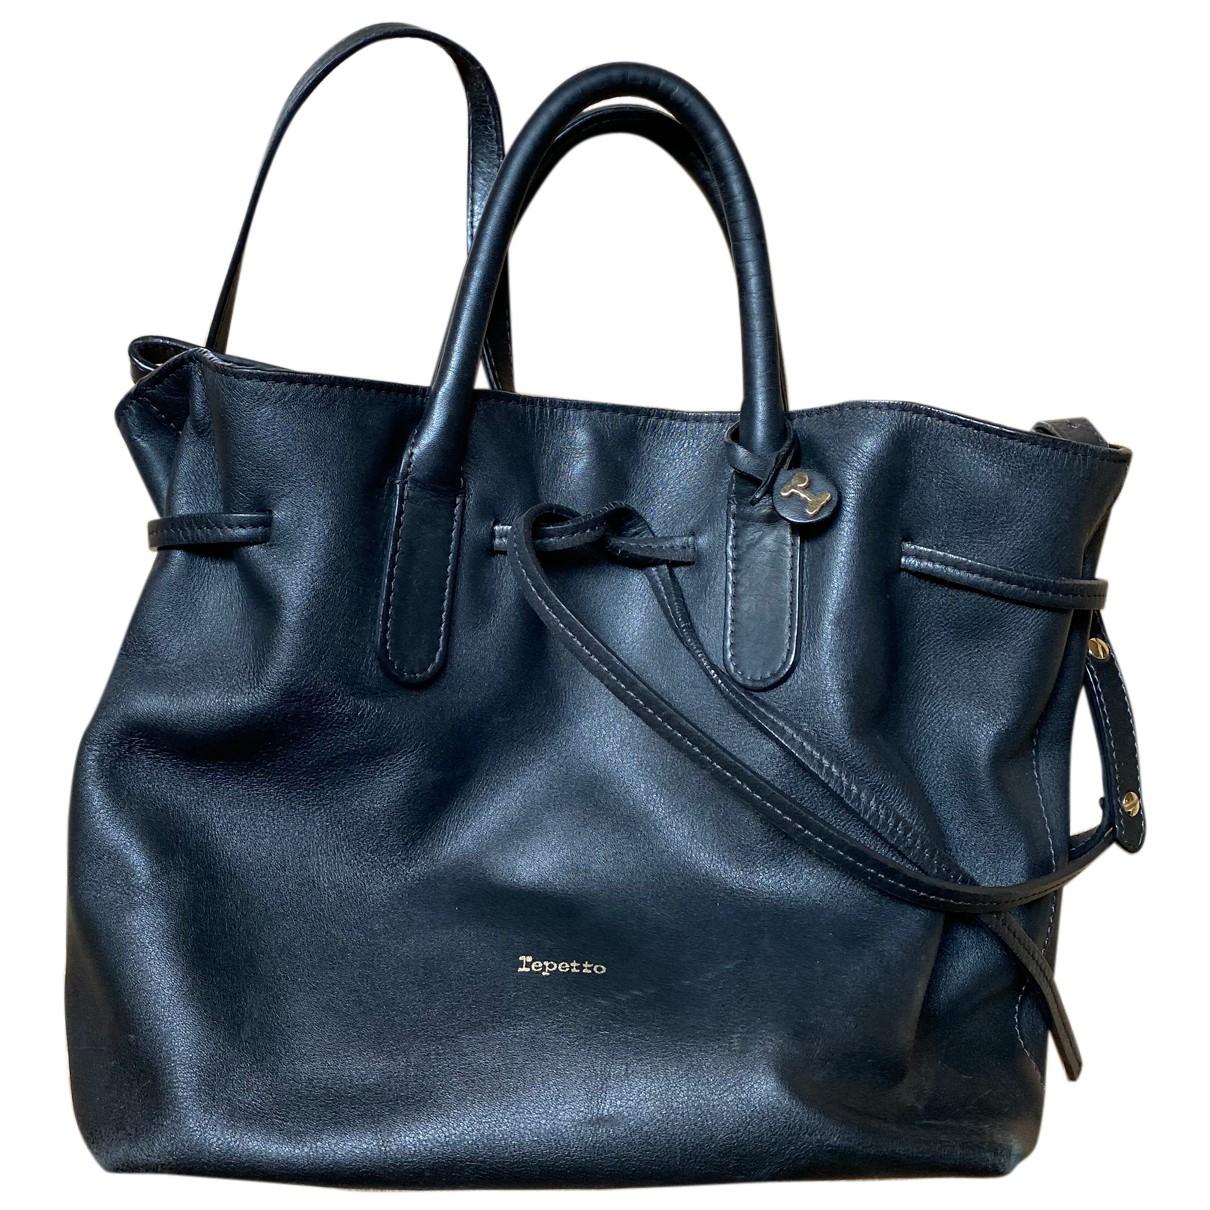 Repetto \N Handtasche in  Schwarz Leder